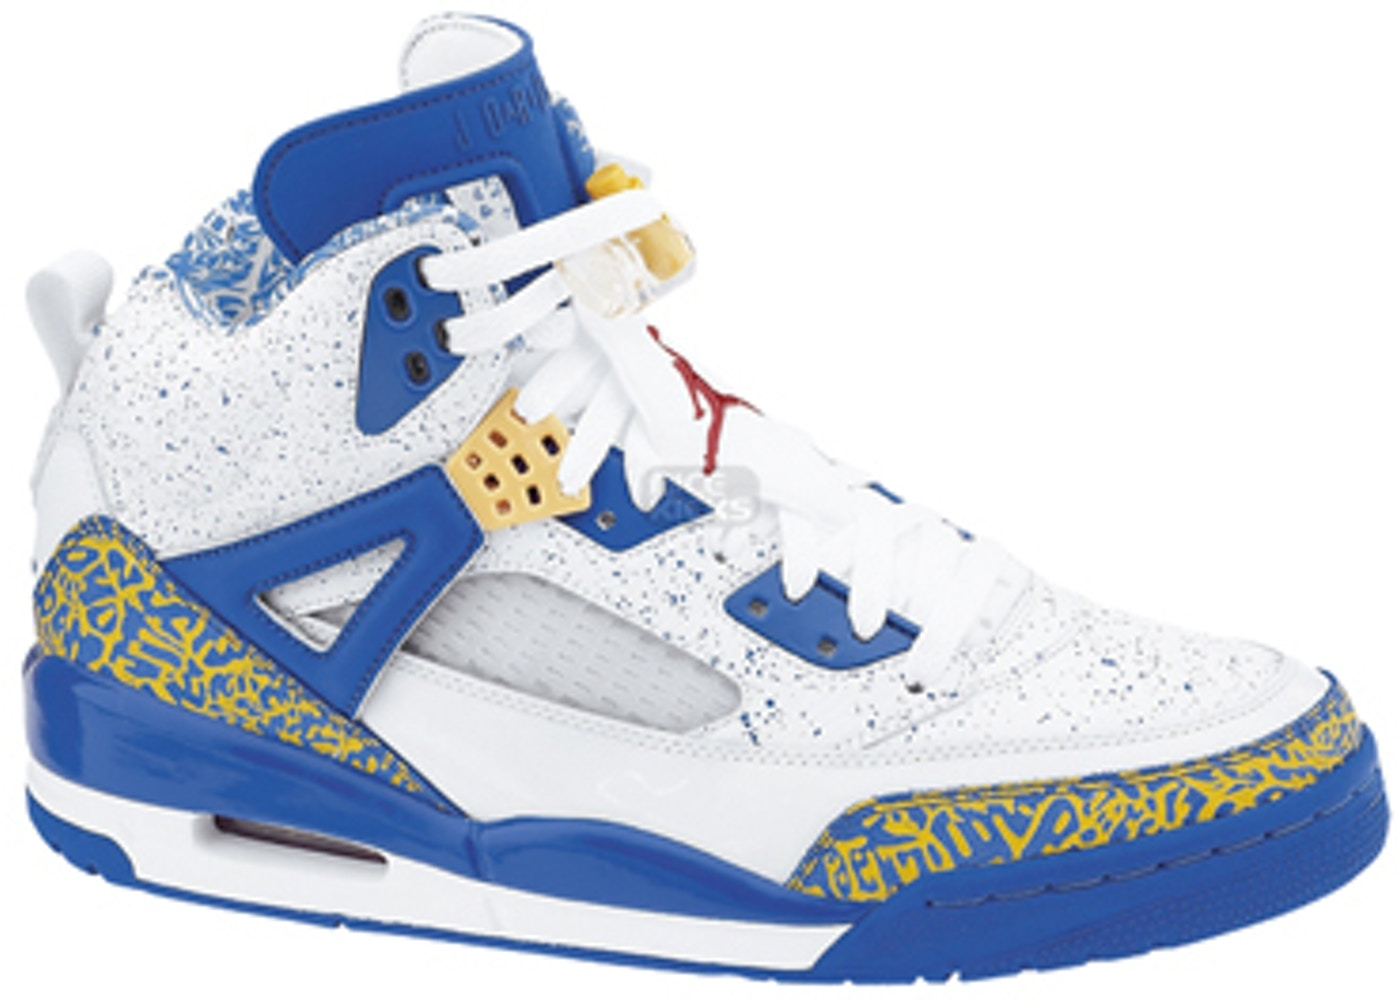 0ea148b4be94 Air Jordan Spizike Size 17 Shoes - Featured